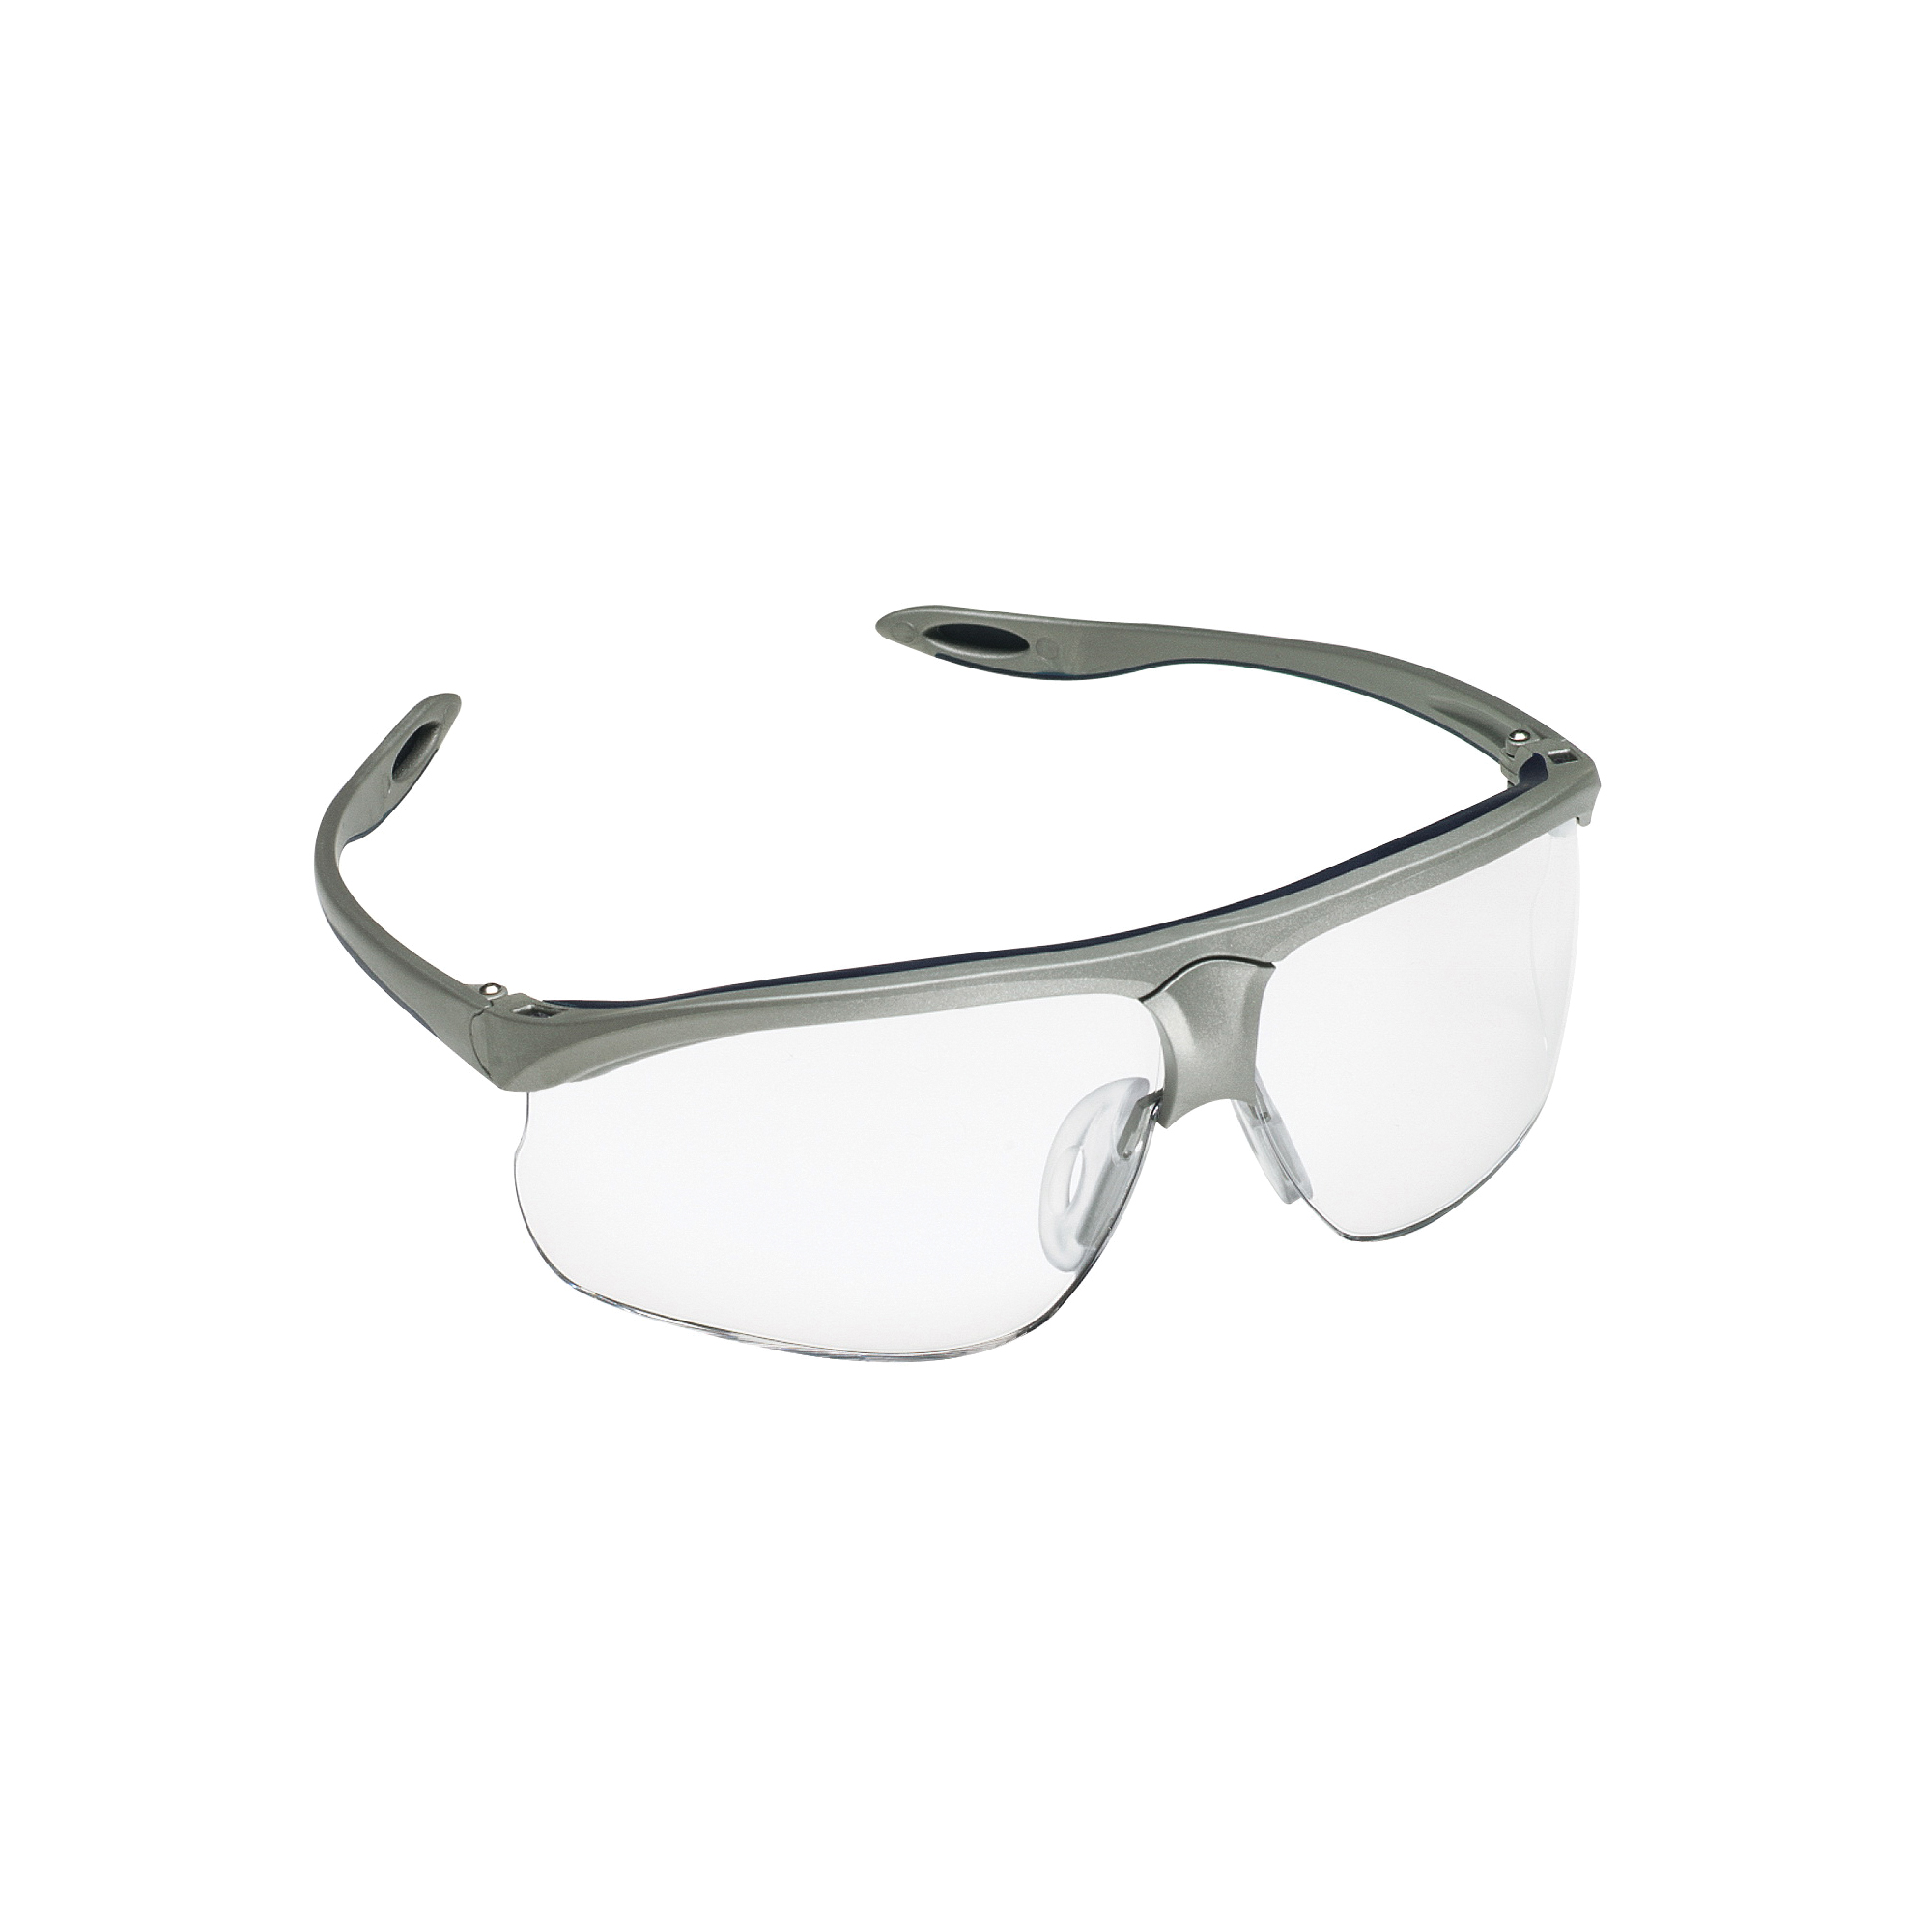 3M™ Maxim™ 078371-62245 13274-10000-20 Sport Sport Value Range Protective Glasses, Anti-Fog/Scratch Resistant Clear Lens, Half Framed Blue/Silver Plastic Frame, Polycarbonate Lens, Specifications Met: ANSI Z87.1, CSA Z94.3